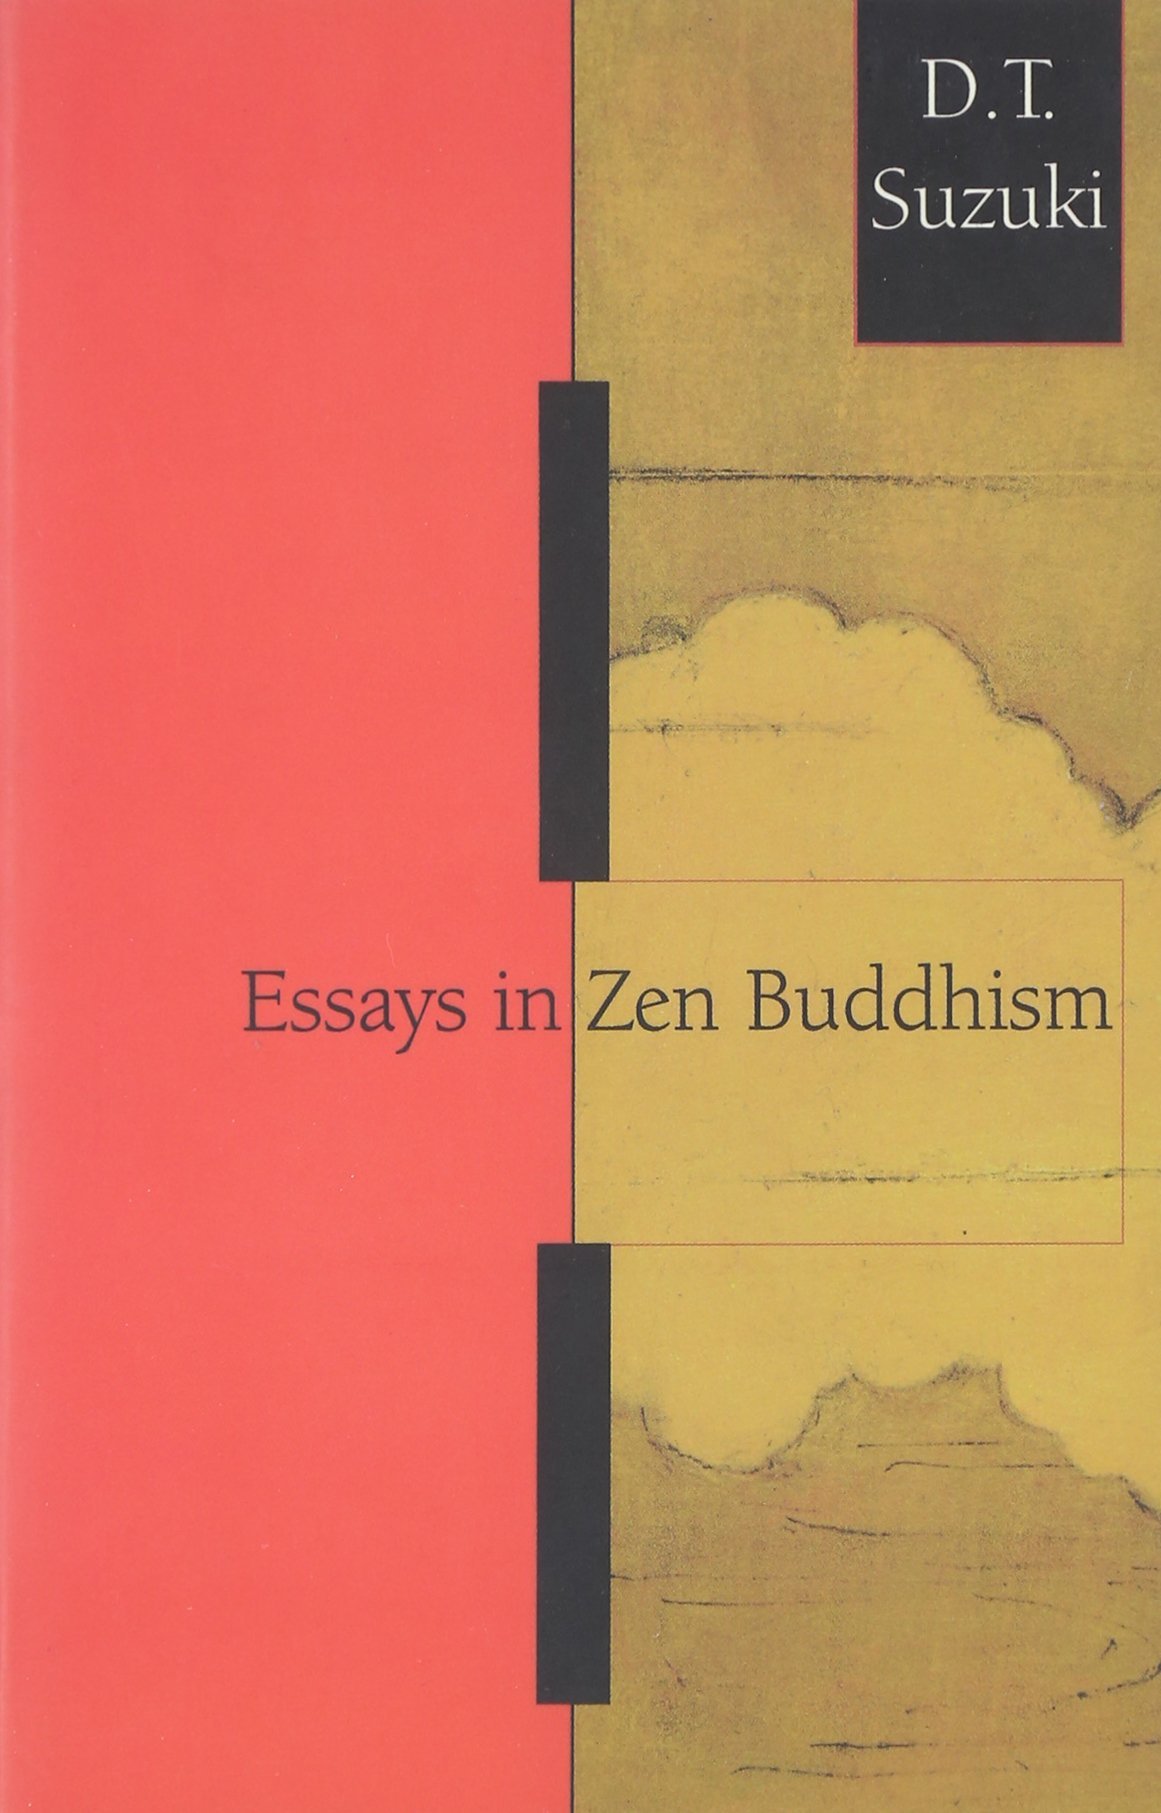 003 71cccelhvrl Essay Example Essays First Stunning Series In Zen Buddhism Emerson's Value Full